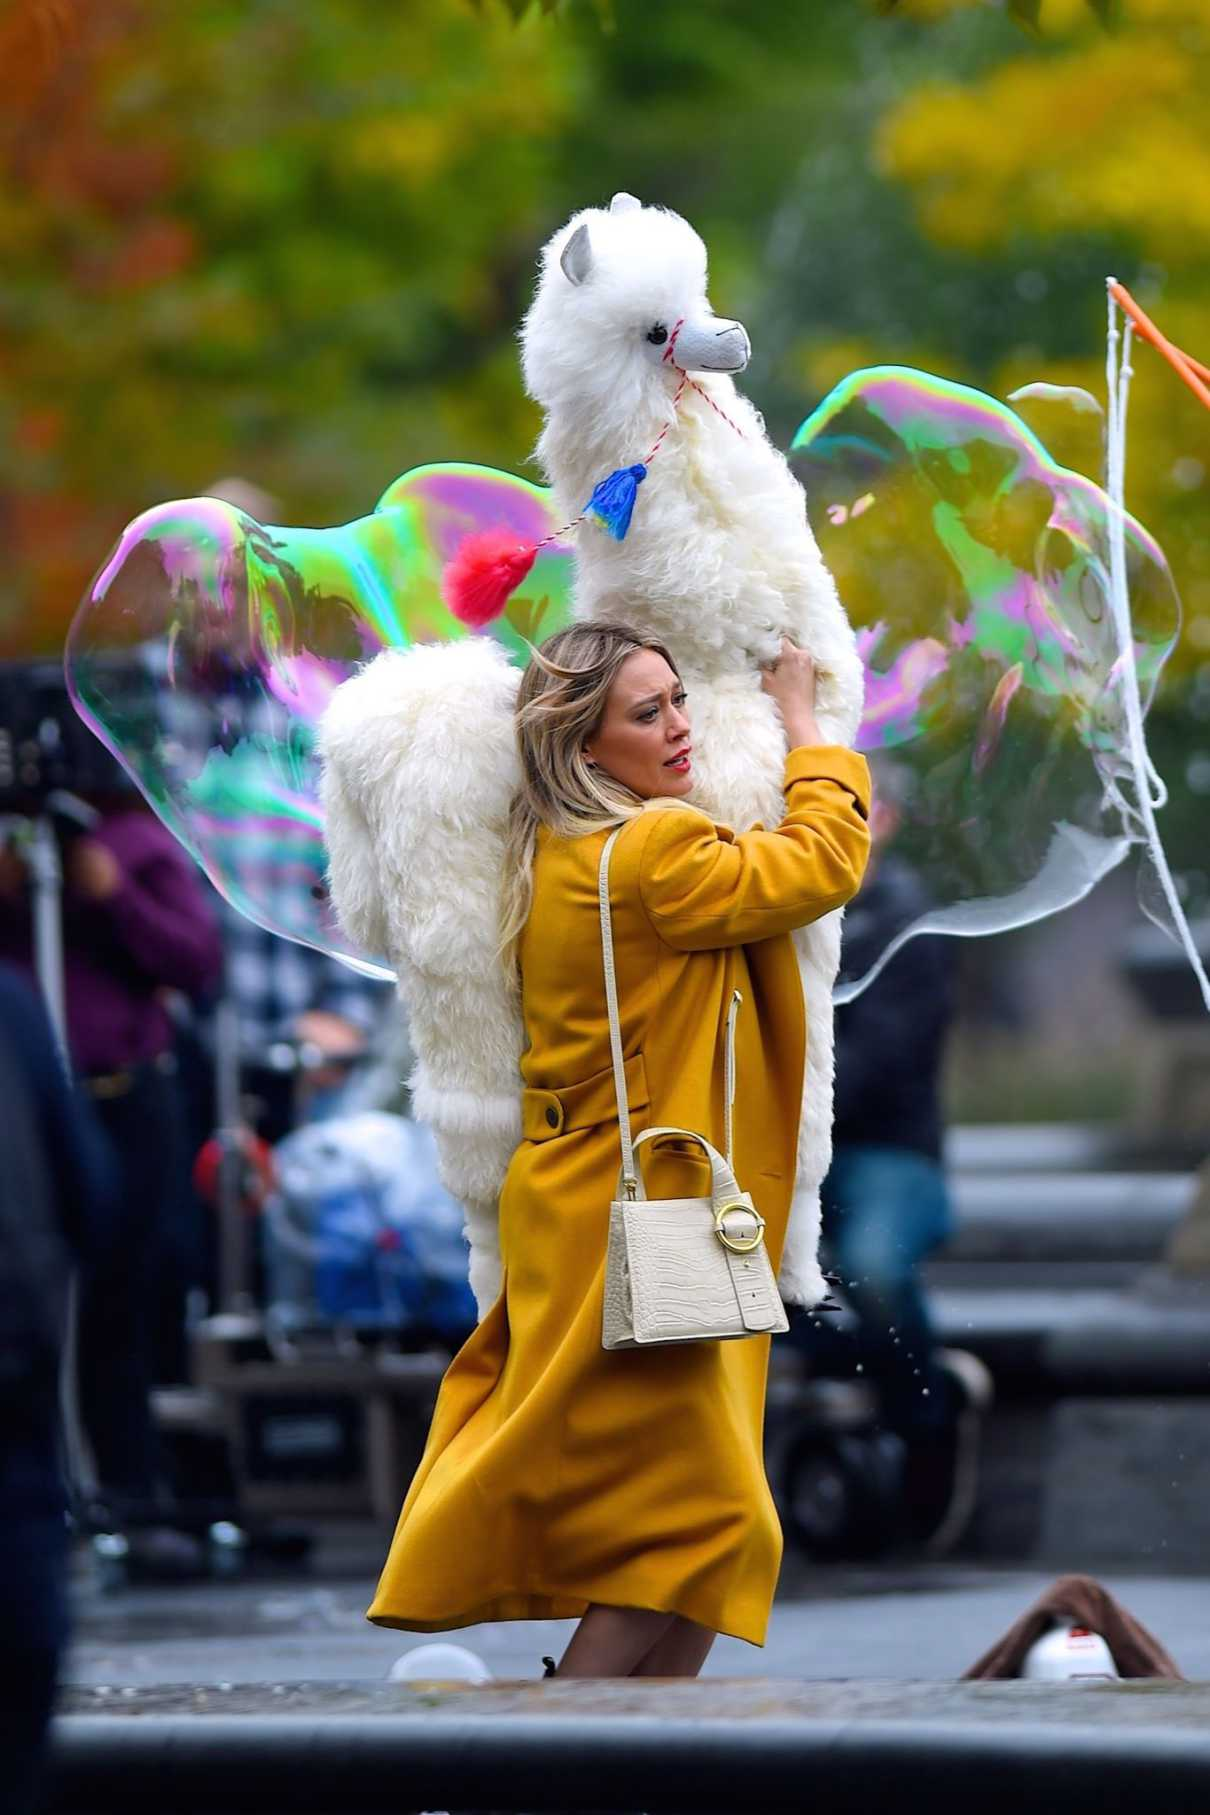 Hilary Duff in a Yellow Coat